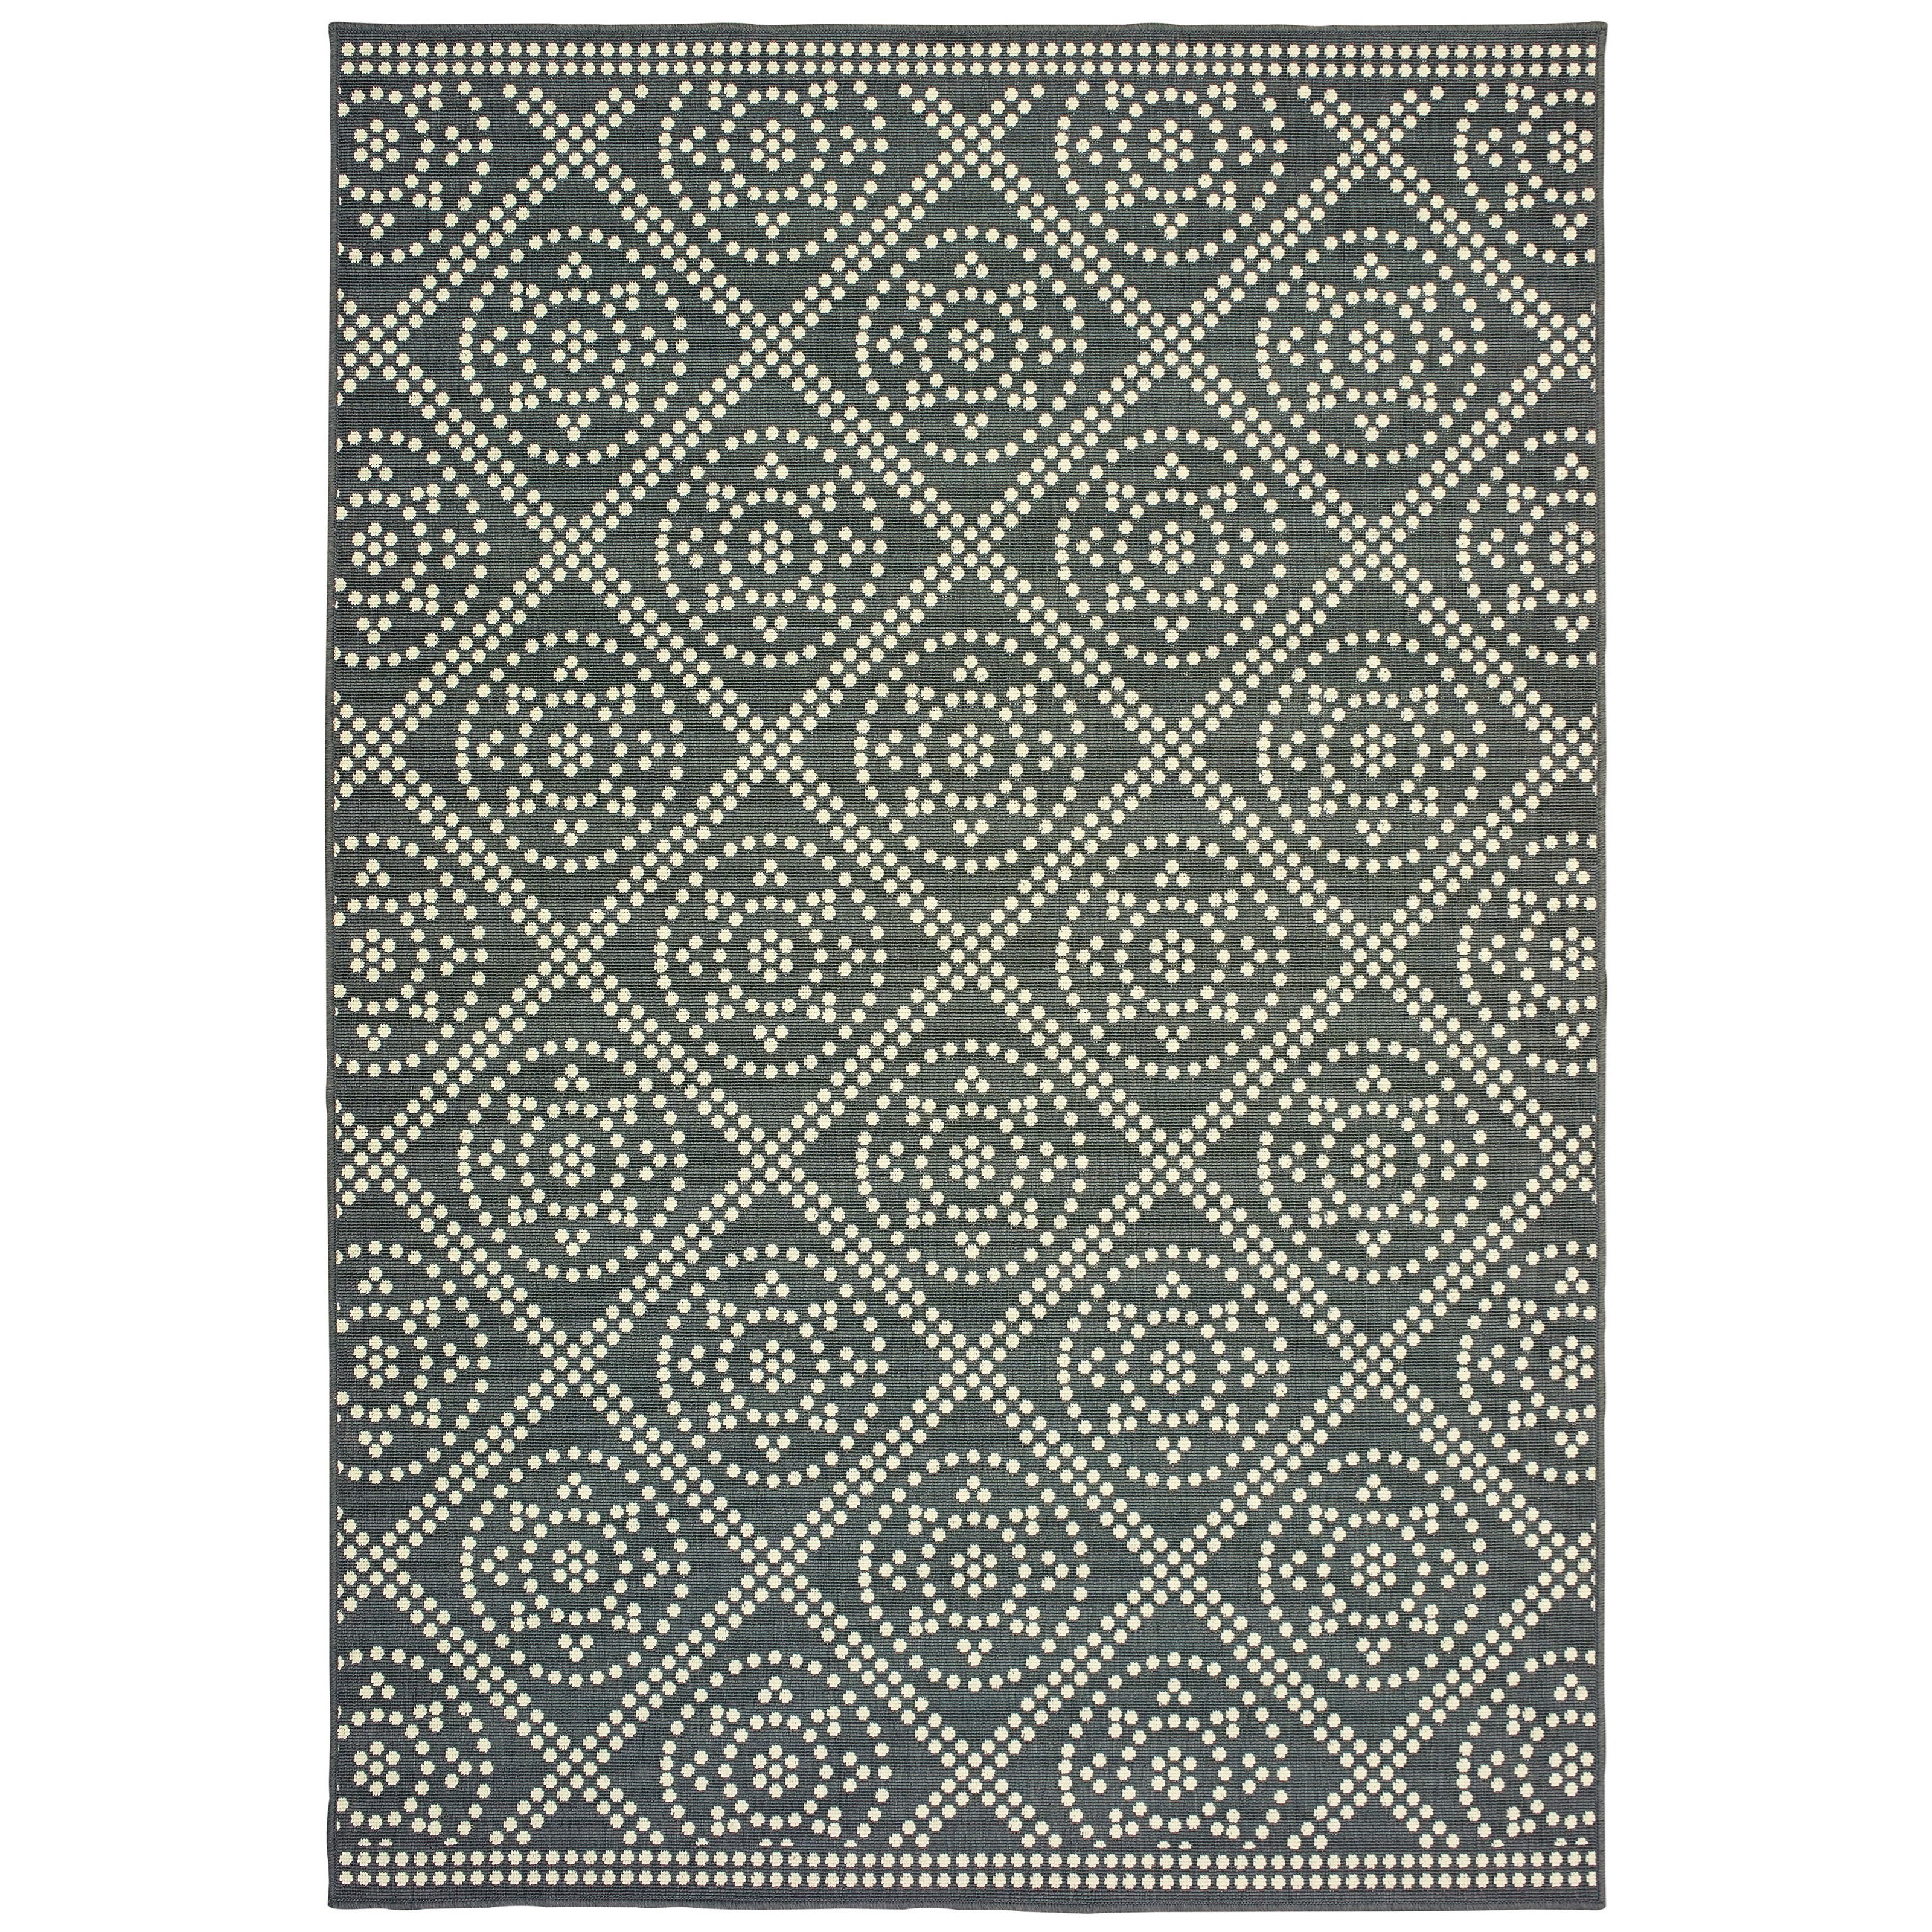 "Marina 7'10"" X 10'10"" Rectangle Rug by Oriental Weavers at Lucas Furniture & Mattress"